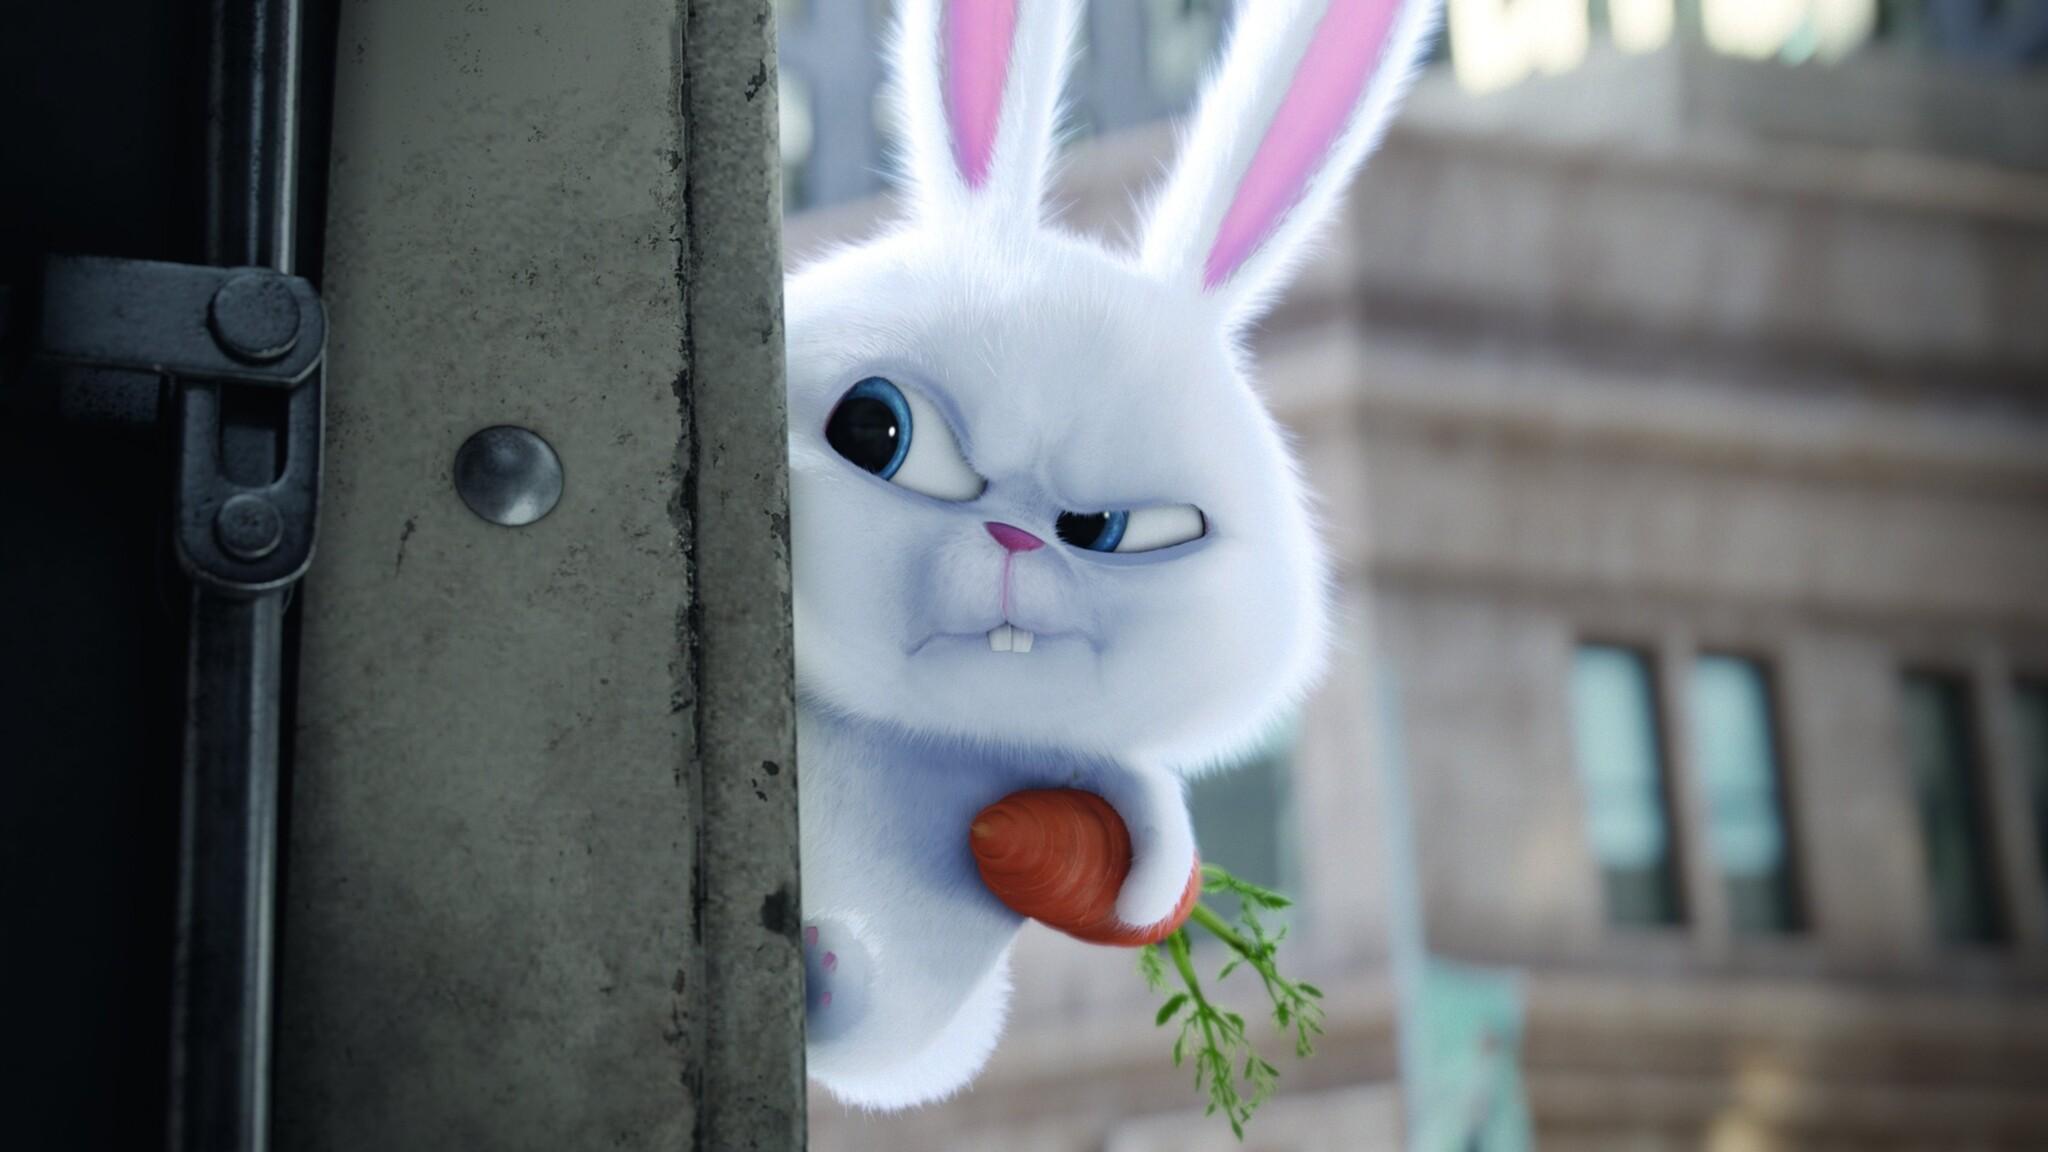 2048x1152 Bunny The Secrete Life Of Pets Movie 2048x1152